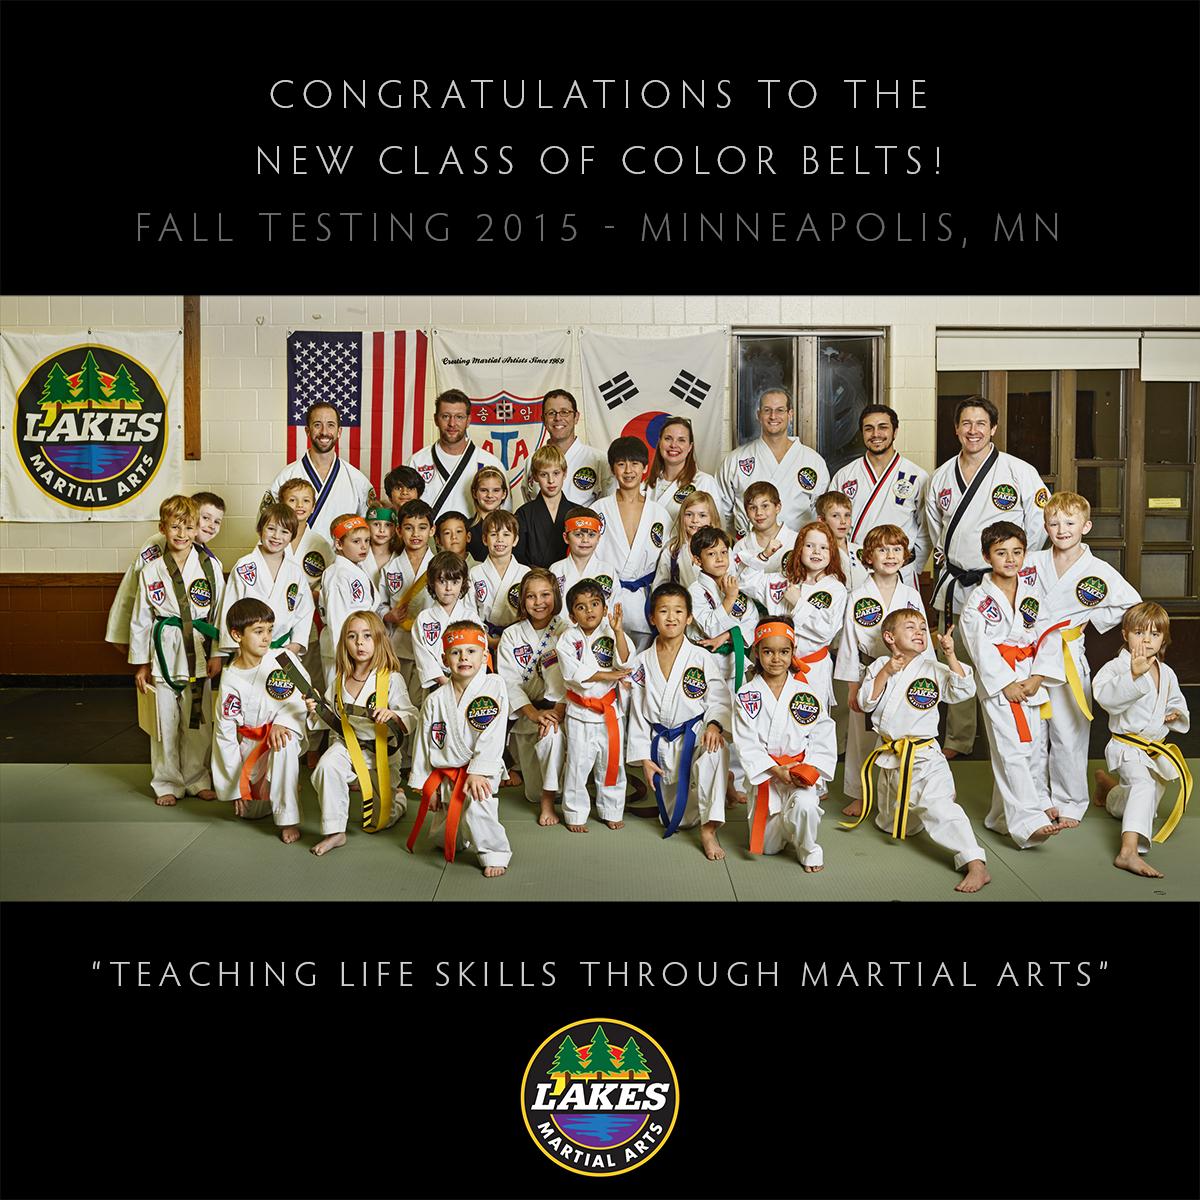 Lakes Martial Arts Fall Testing 2015 in Minneapolis, MN.